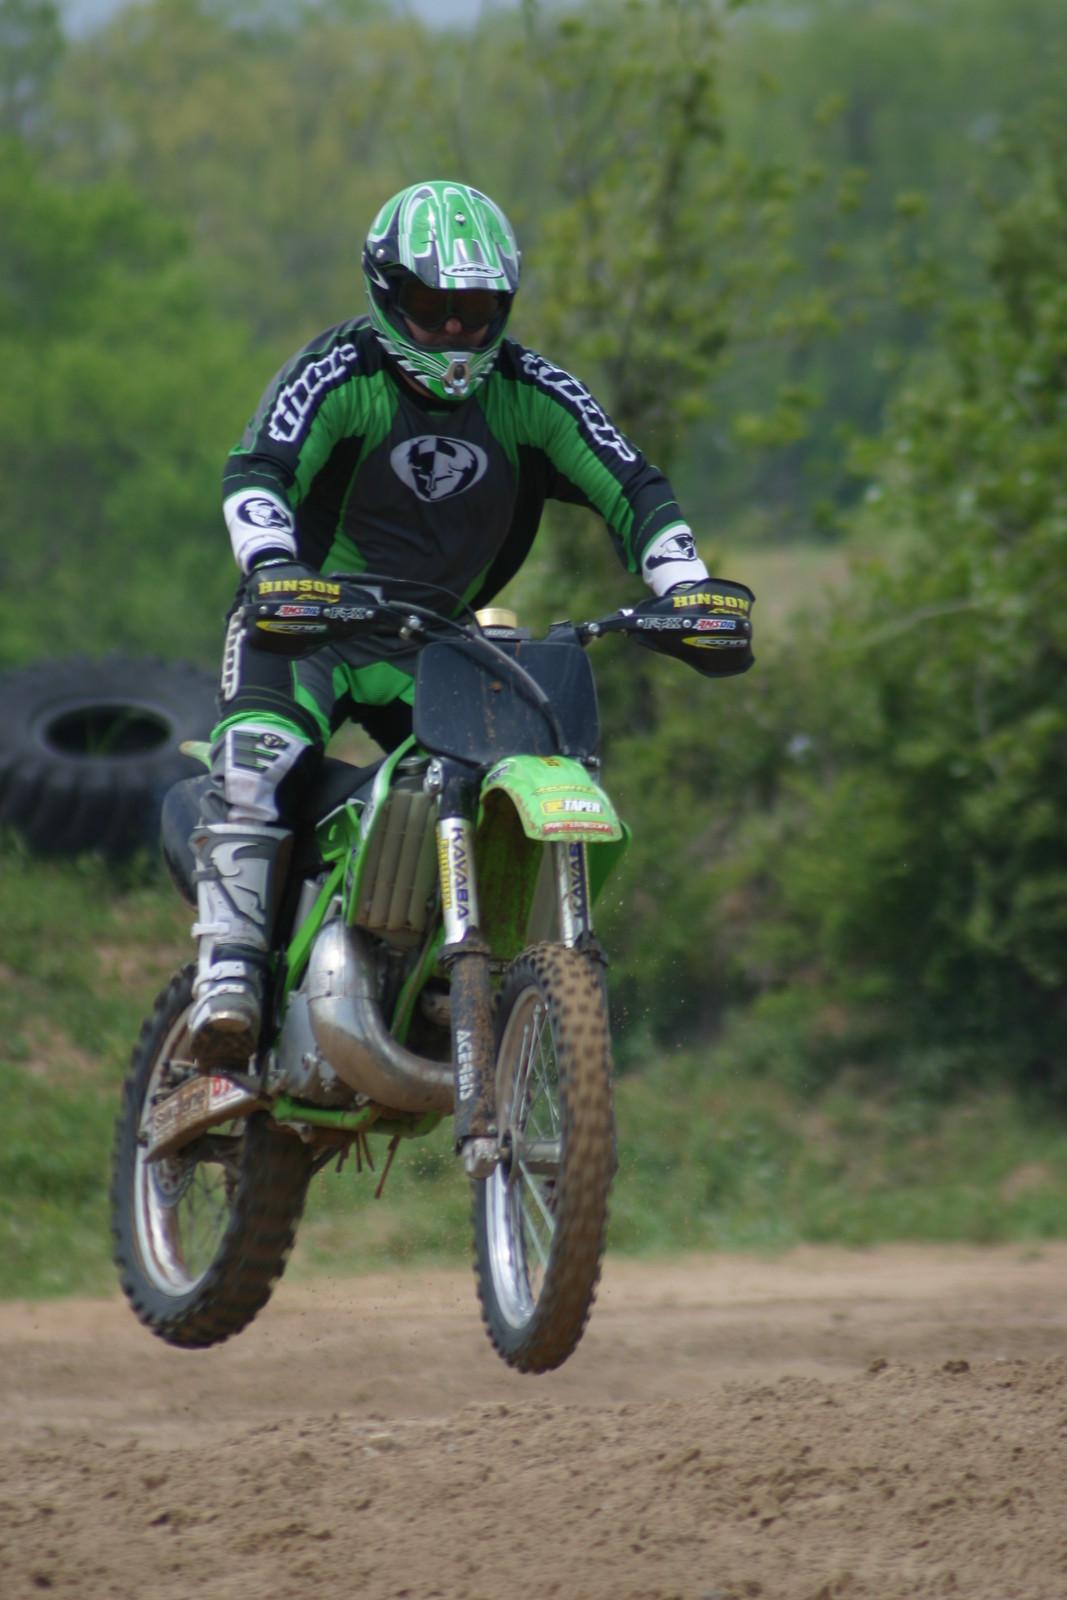 bulcher,tx - bigcat - Motocross Pictures - Vital MX